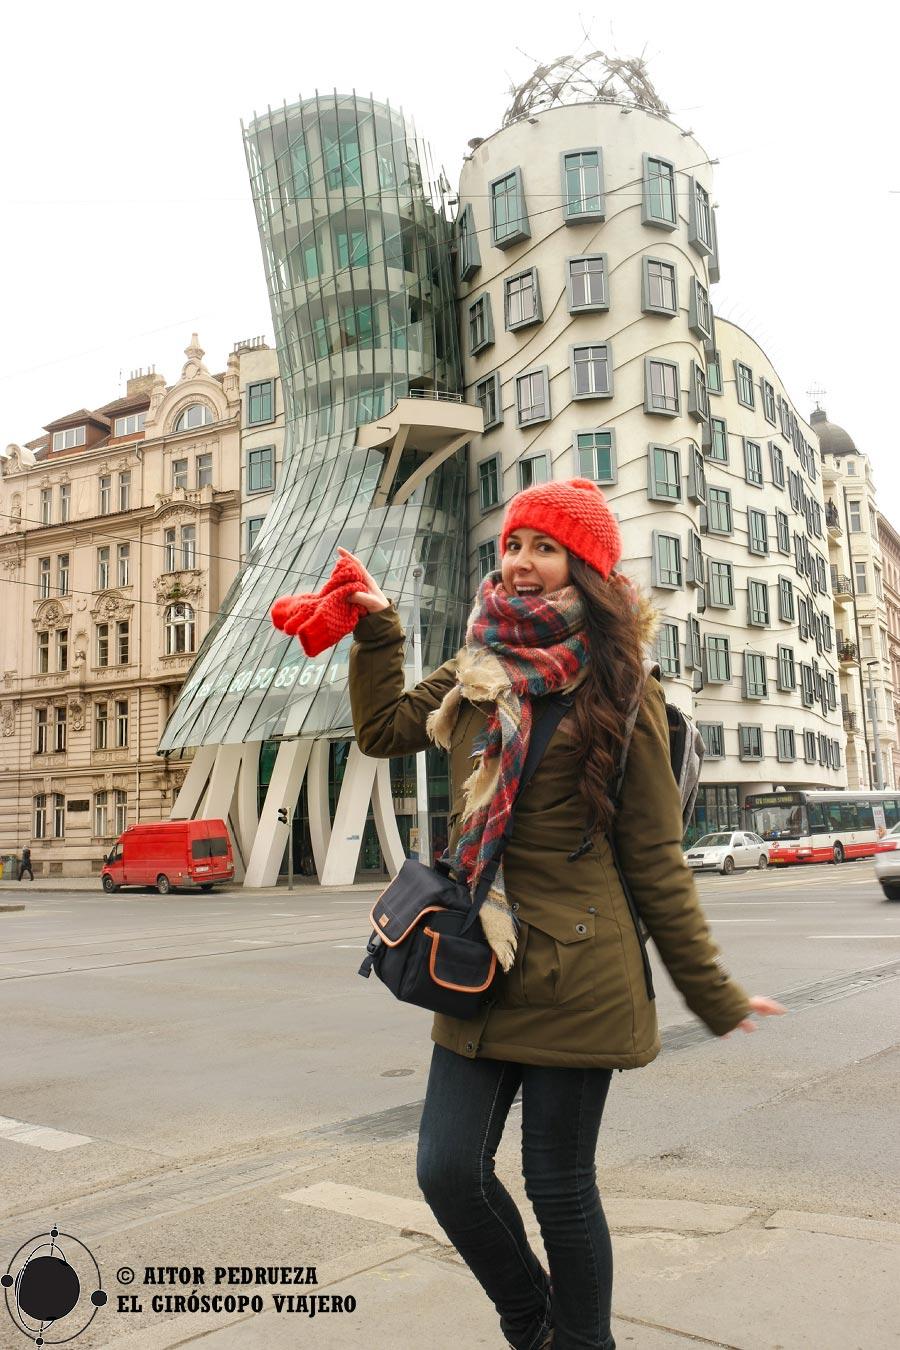 Bailando frente a la Casa Danzante de Praga